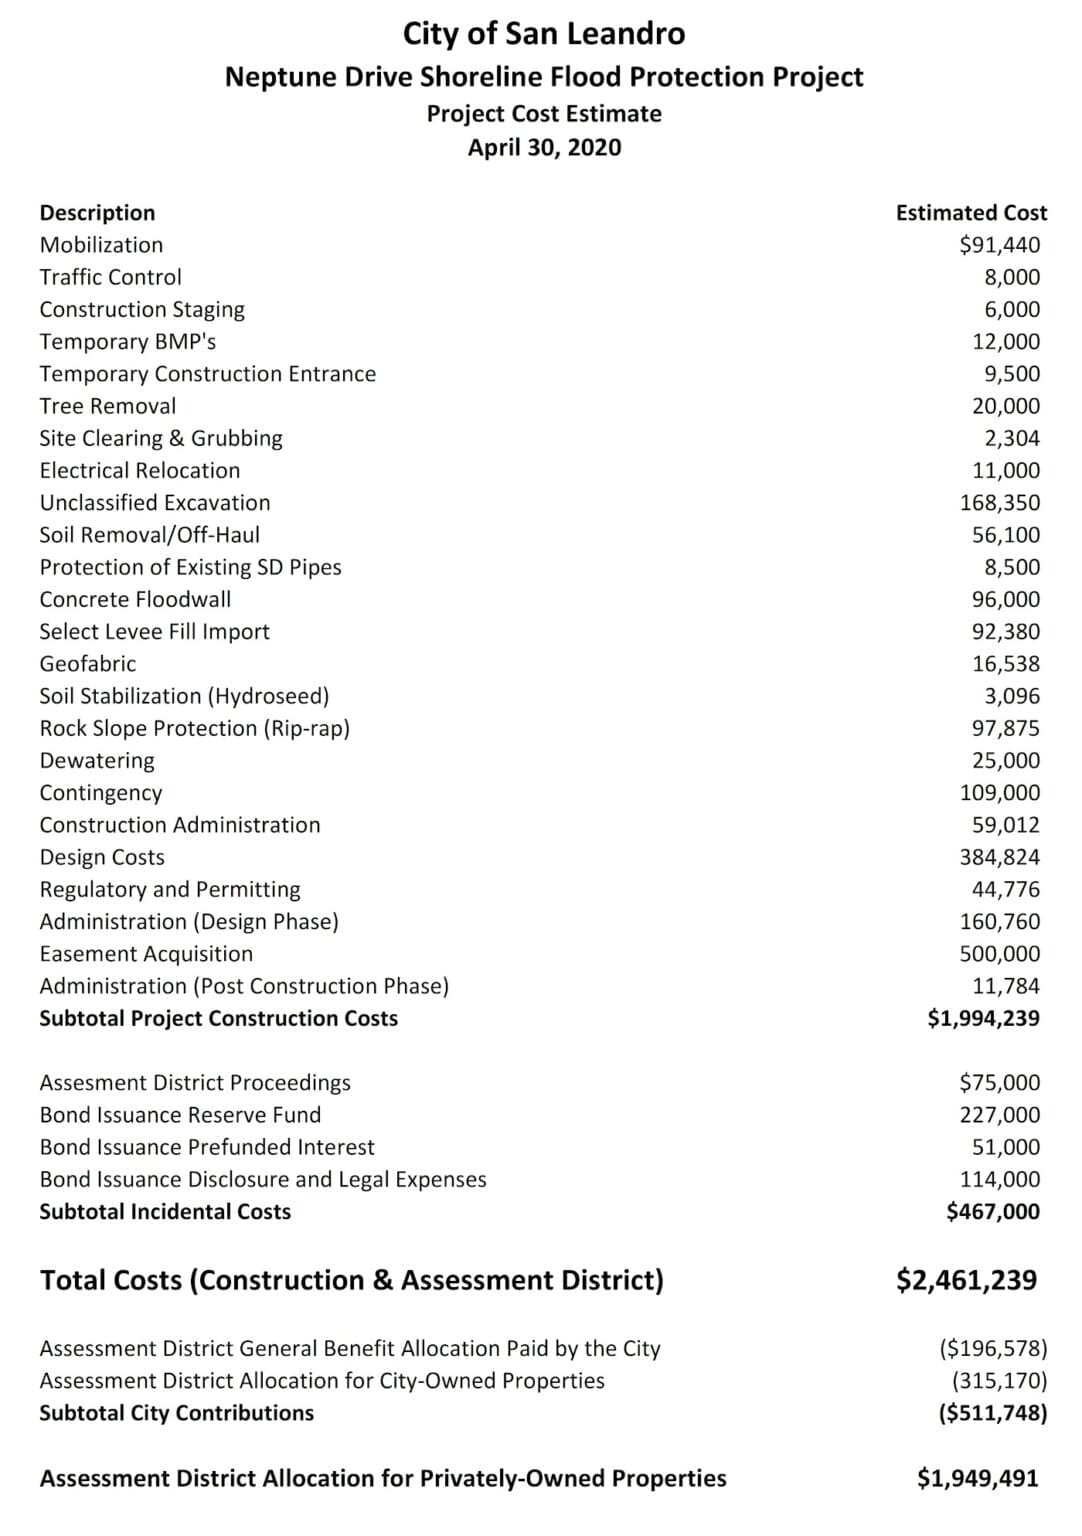 Netpune Drive Project Cost Estimate